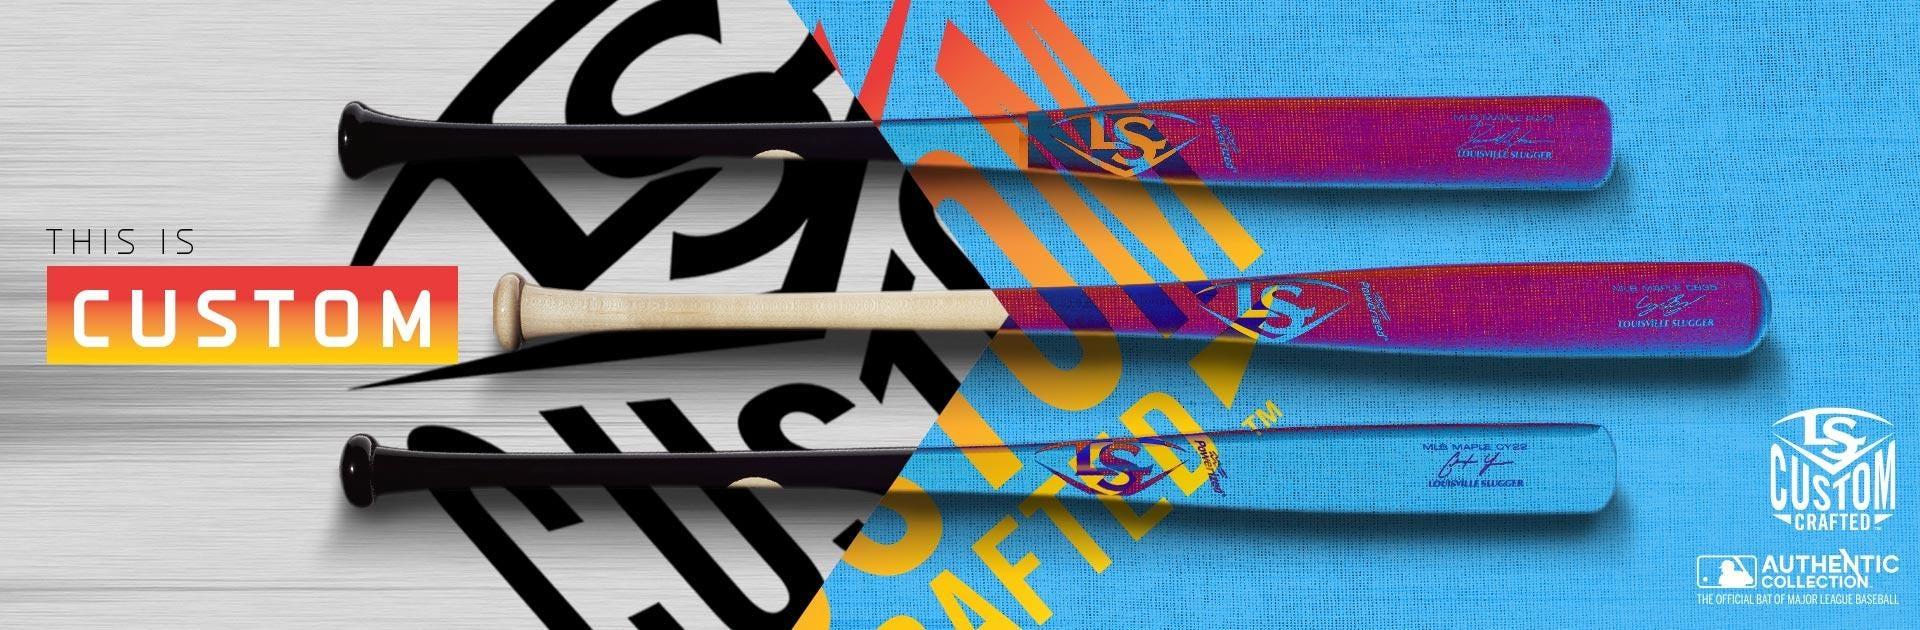 Customized MLB Baseball Bats